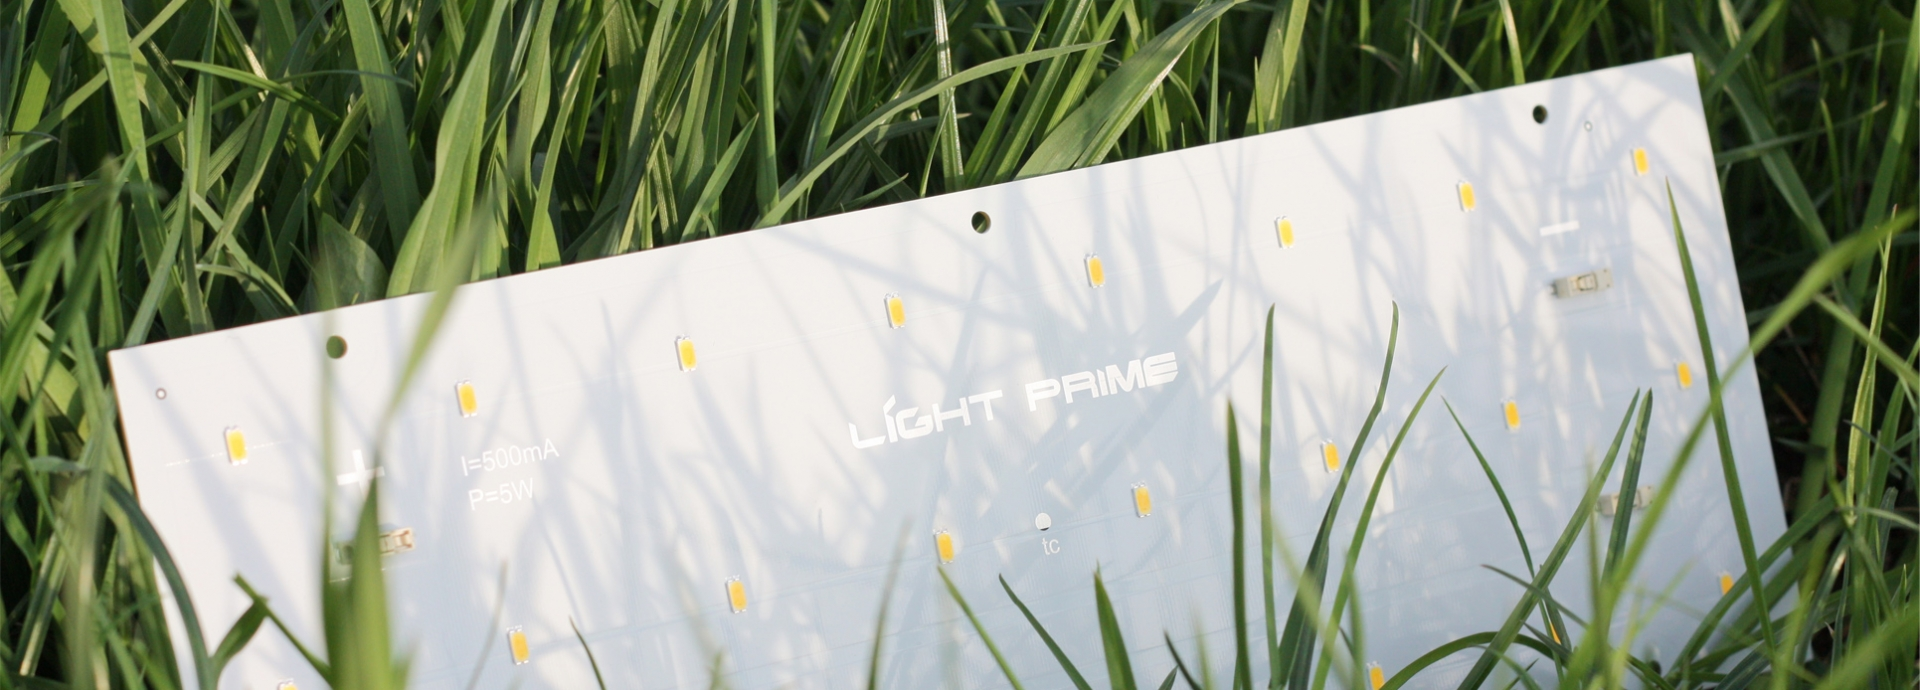 Лайт прайм Light prime